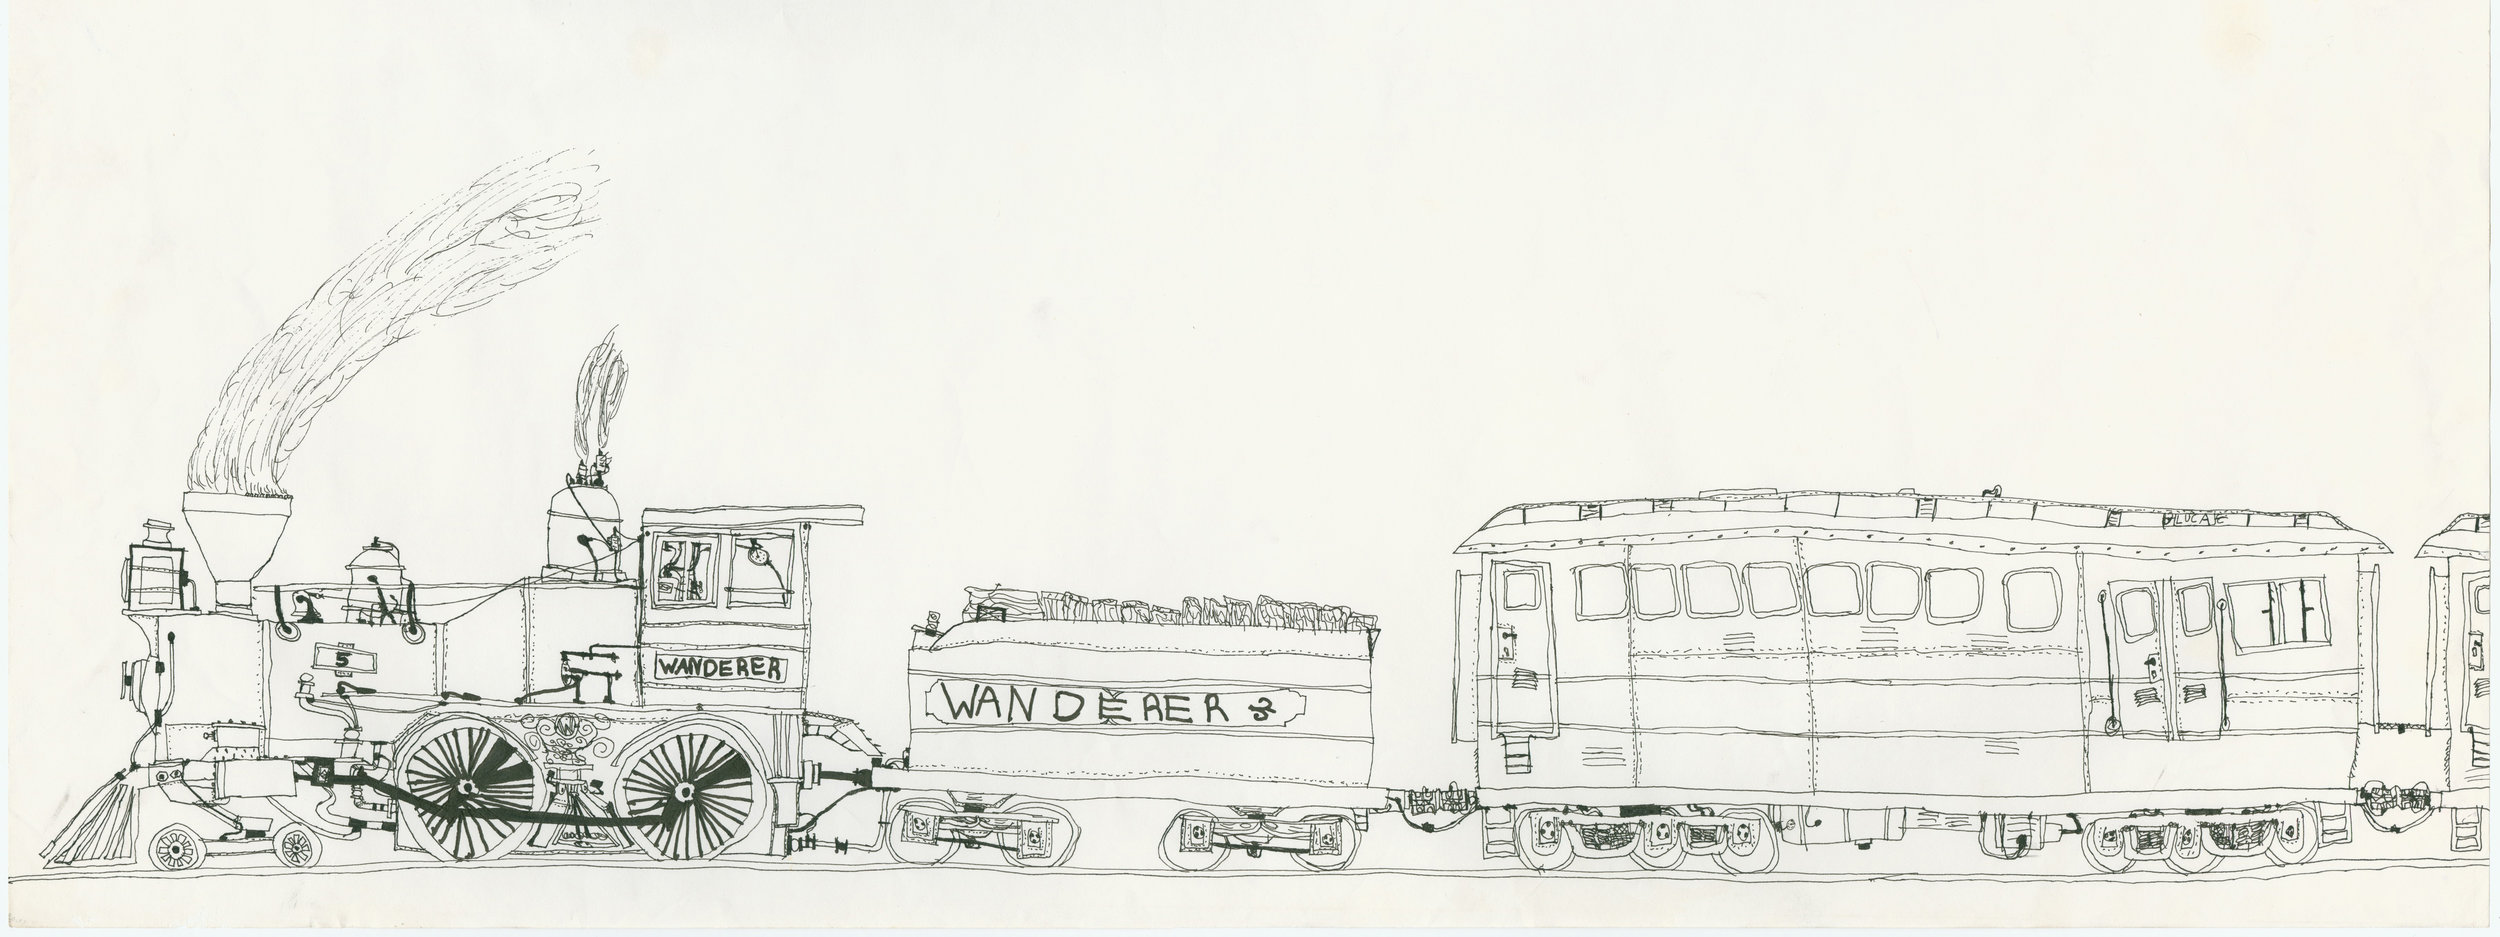 200X - 009 - Wanderer train.pdf0000.jpg